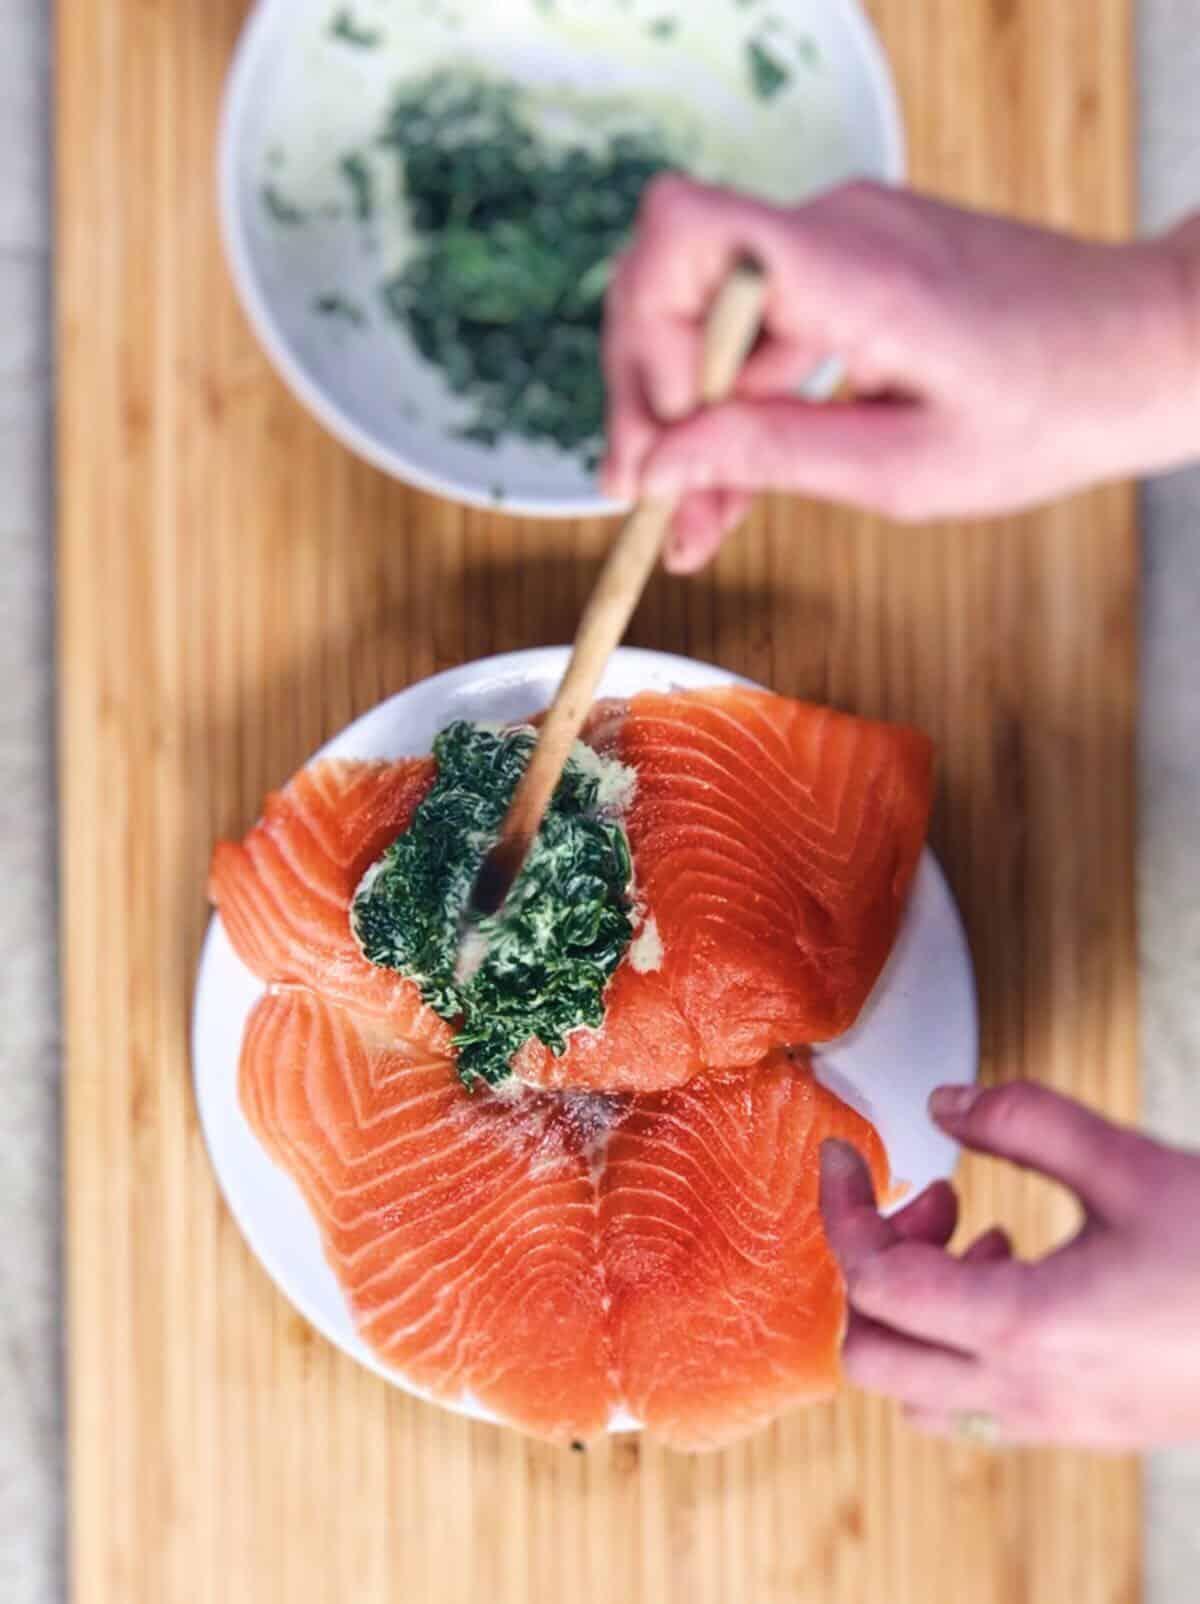 salmón fresco y espinacas en microondas